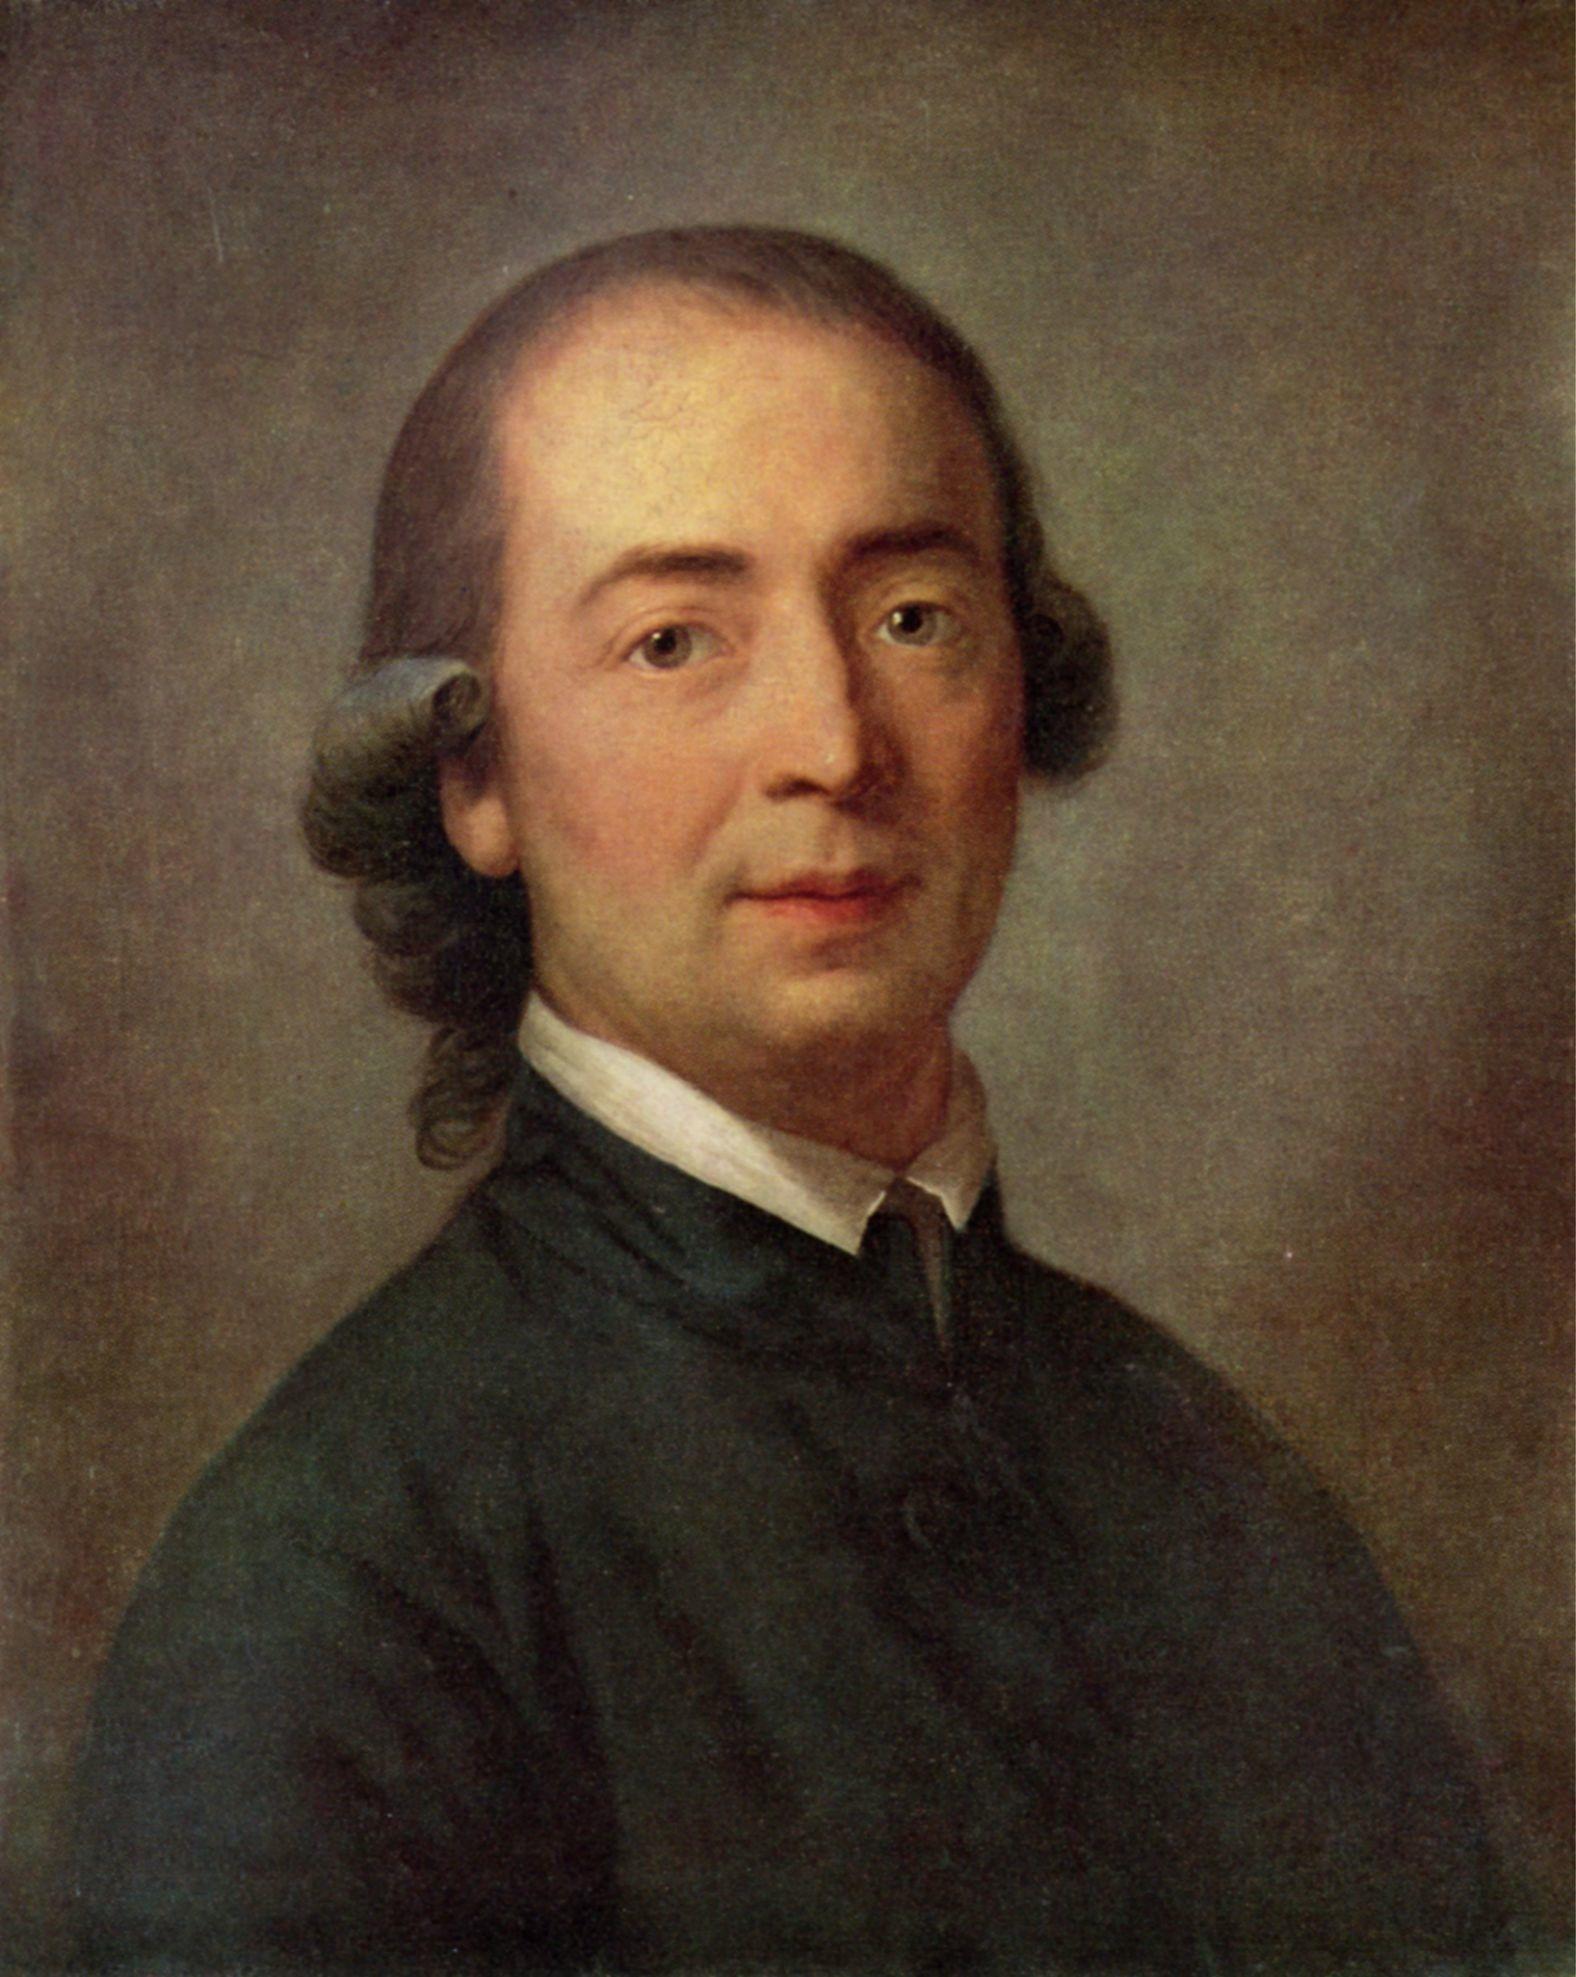 Johann Gottfried Herder, painting by Anton Graff, in 1785.